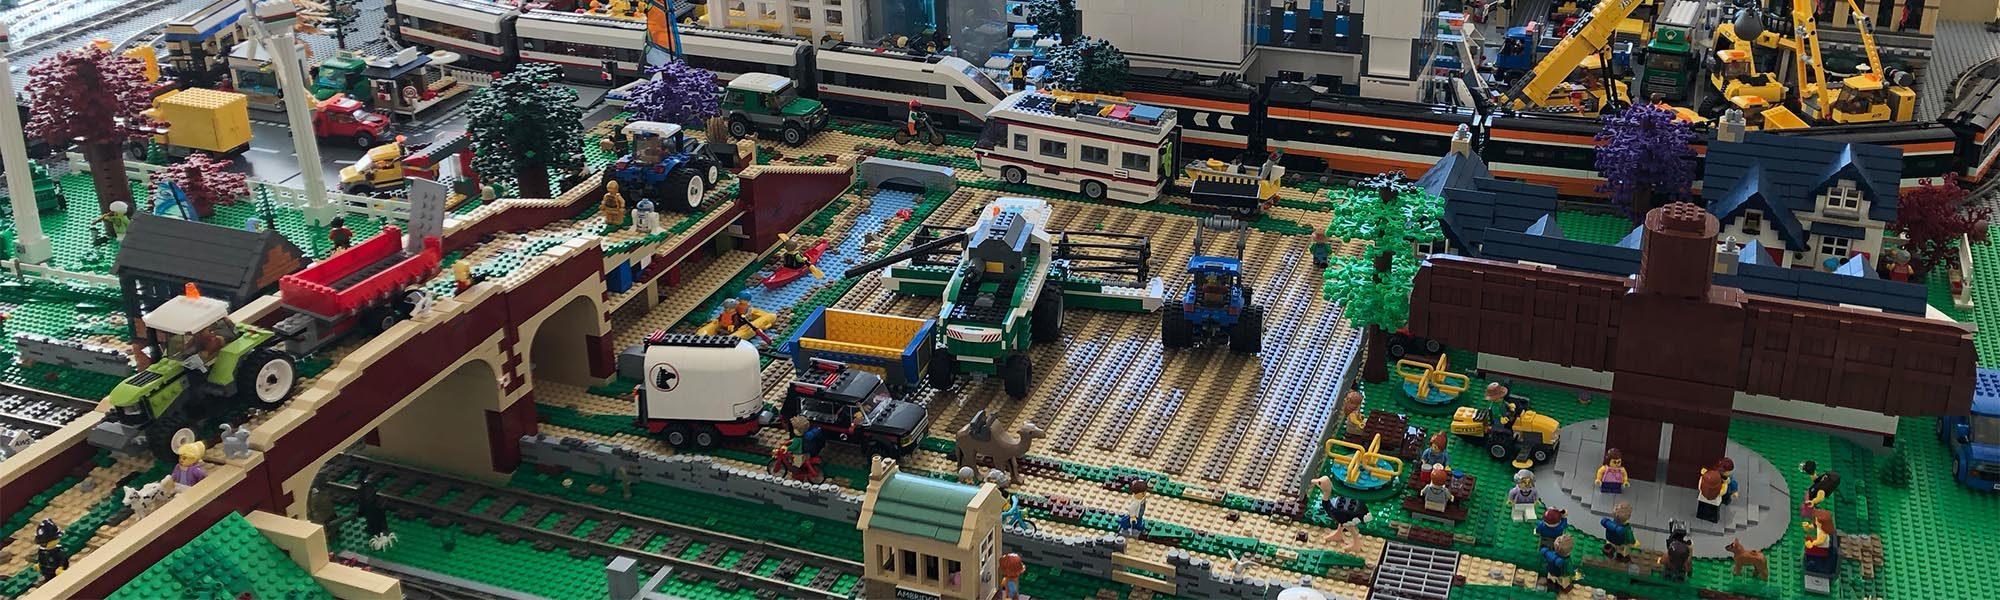 Amchester LEGO city